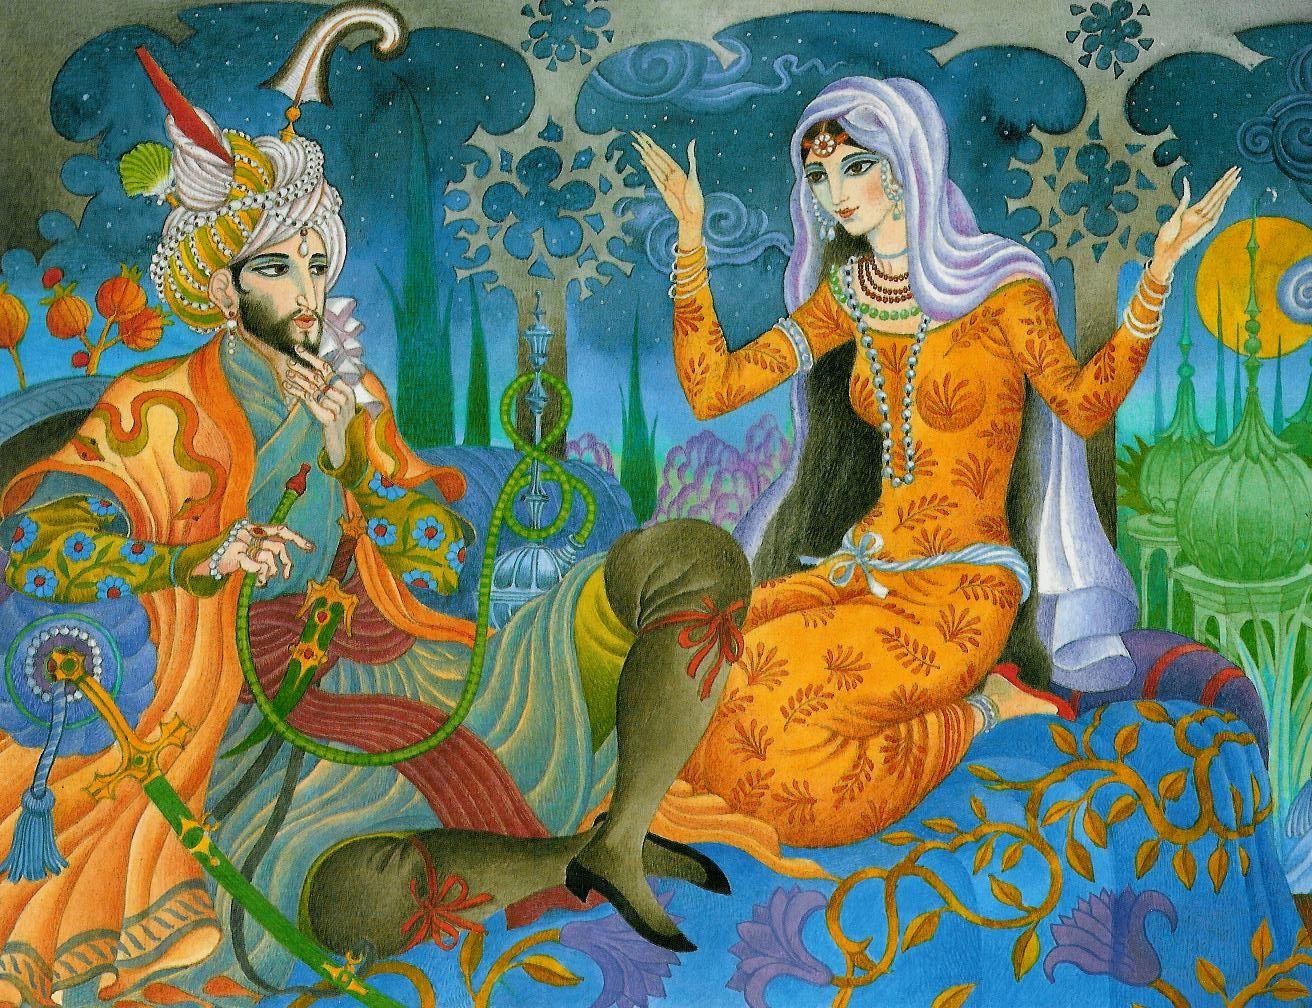 султан шахриар картинки таким образом